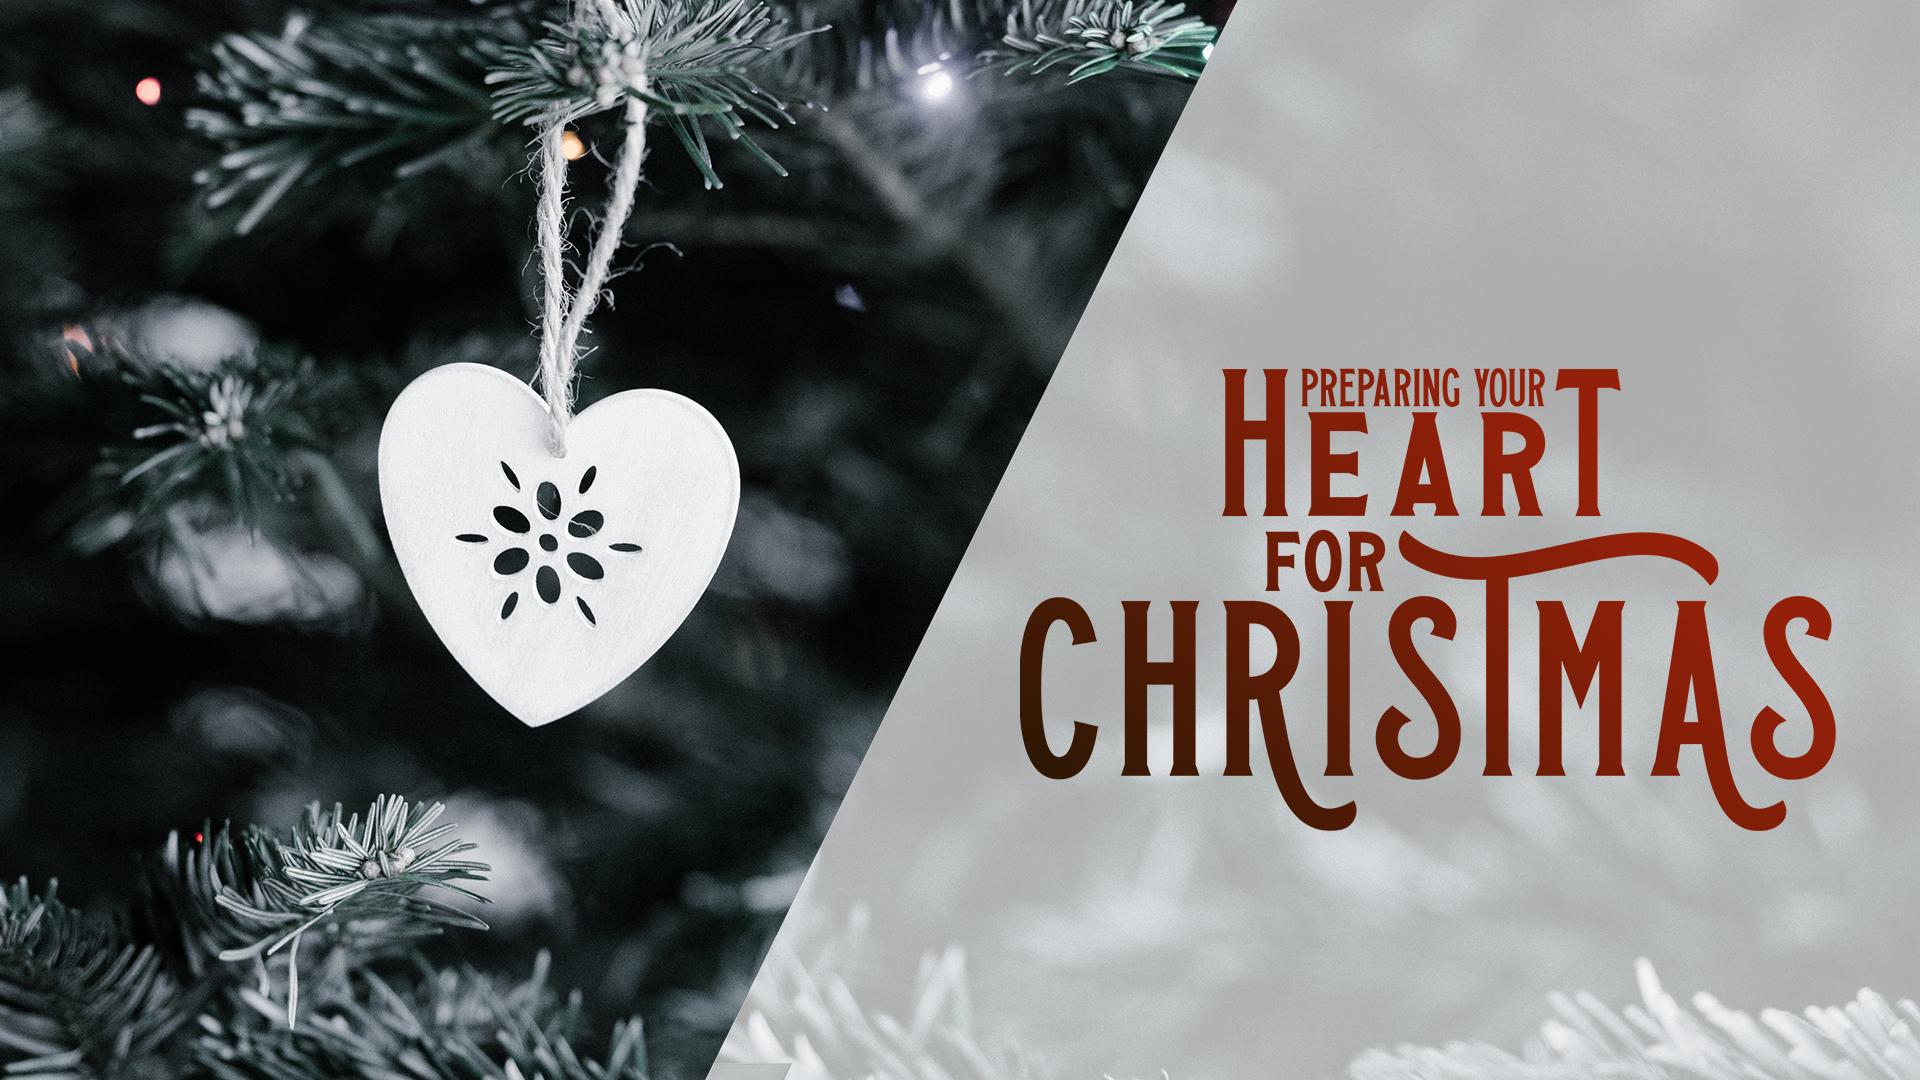 Preparing Your Heart for Christmas (December 2018)